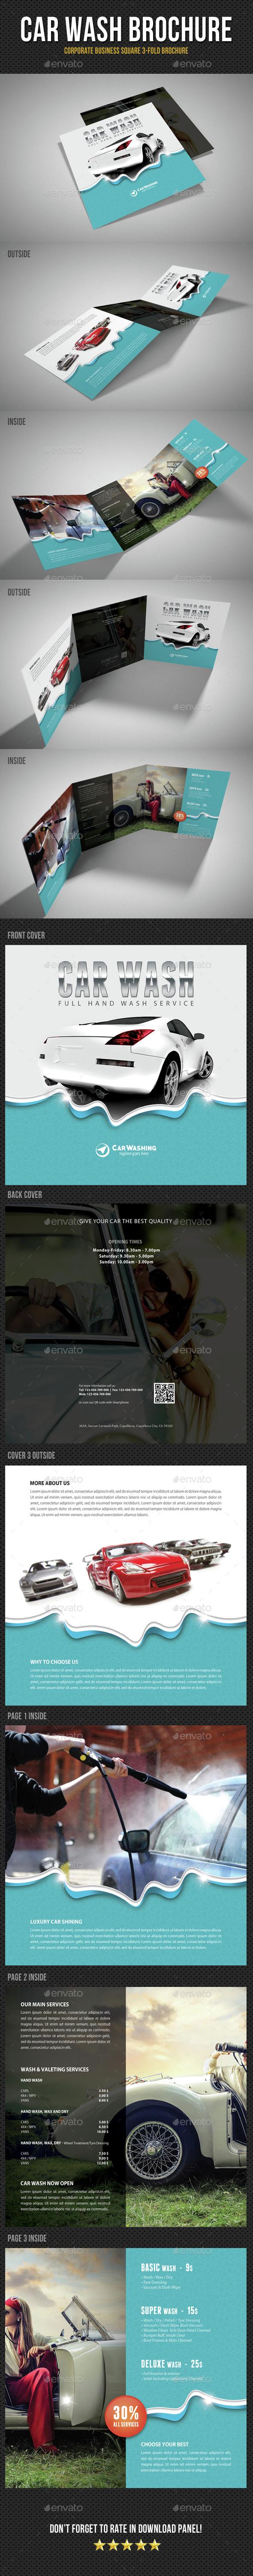 Car Wash Square 3-Fold Brochure 02 - Brochures Print Templates